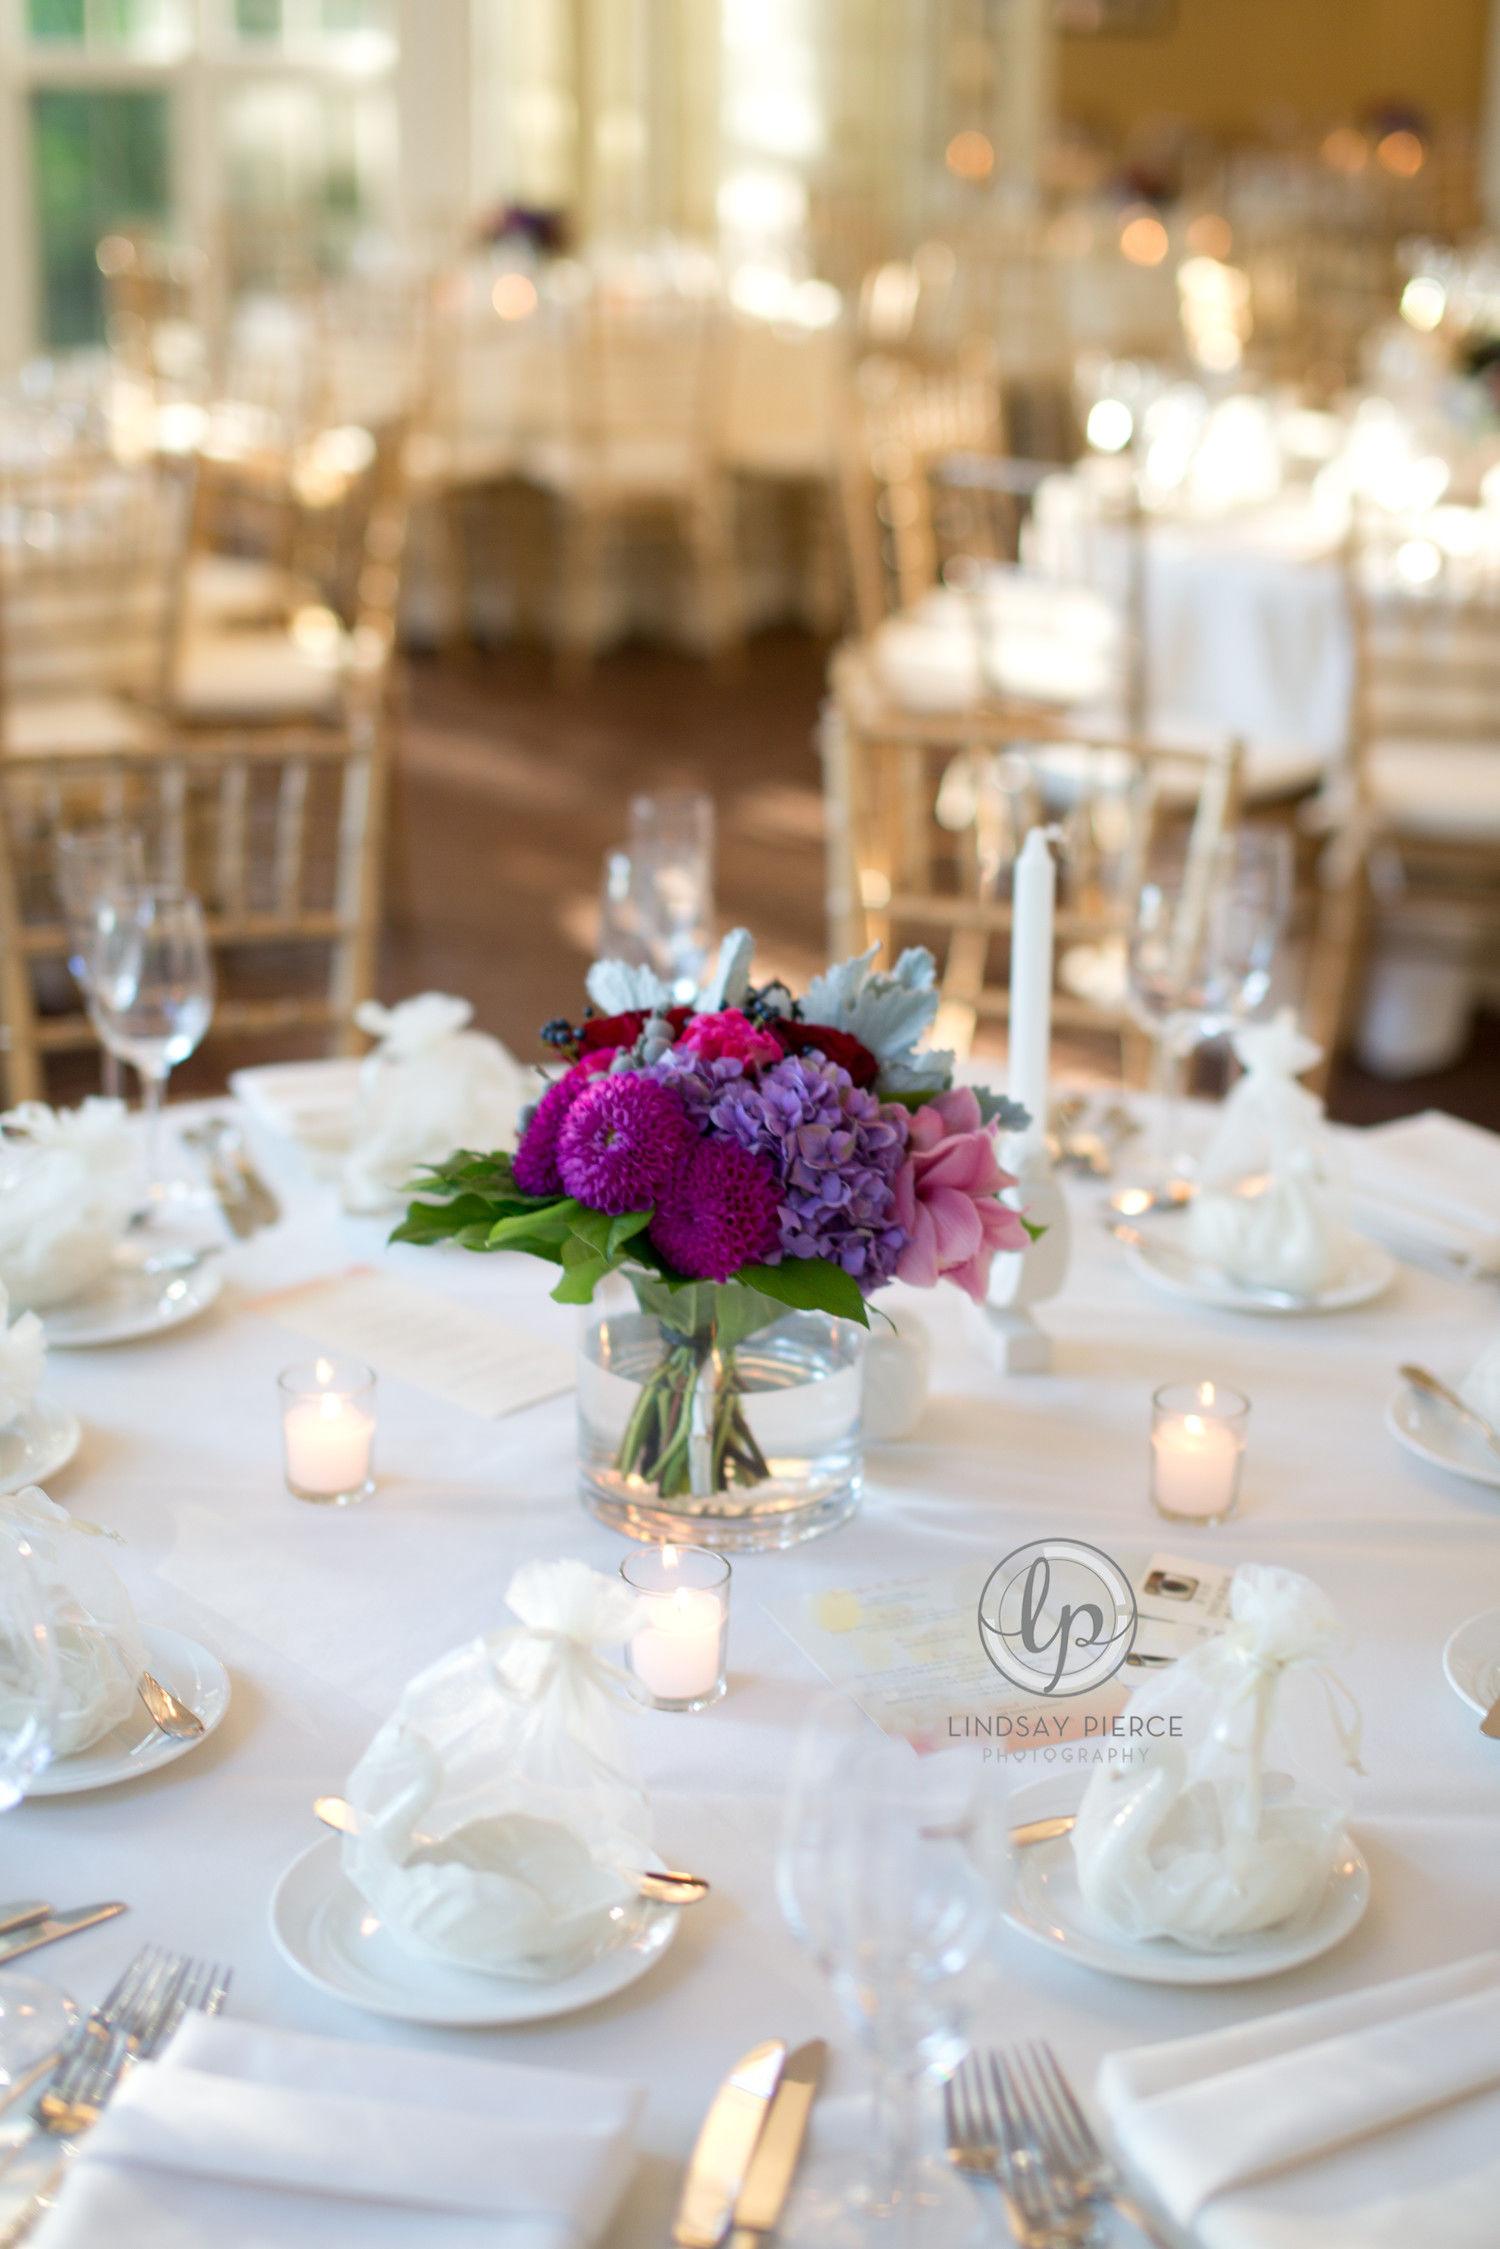 Wedding Centerpieces Designs Danvers Local Wedding Florist